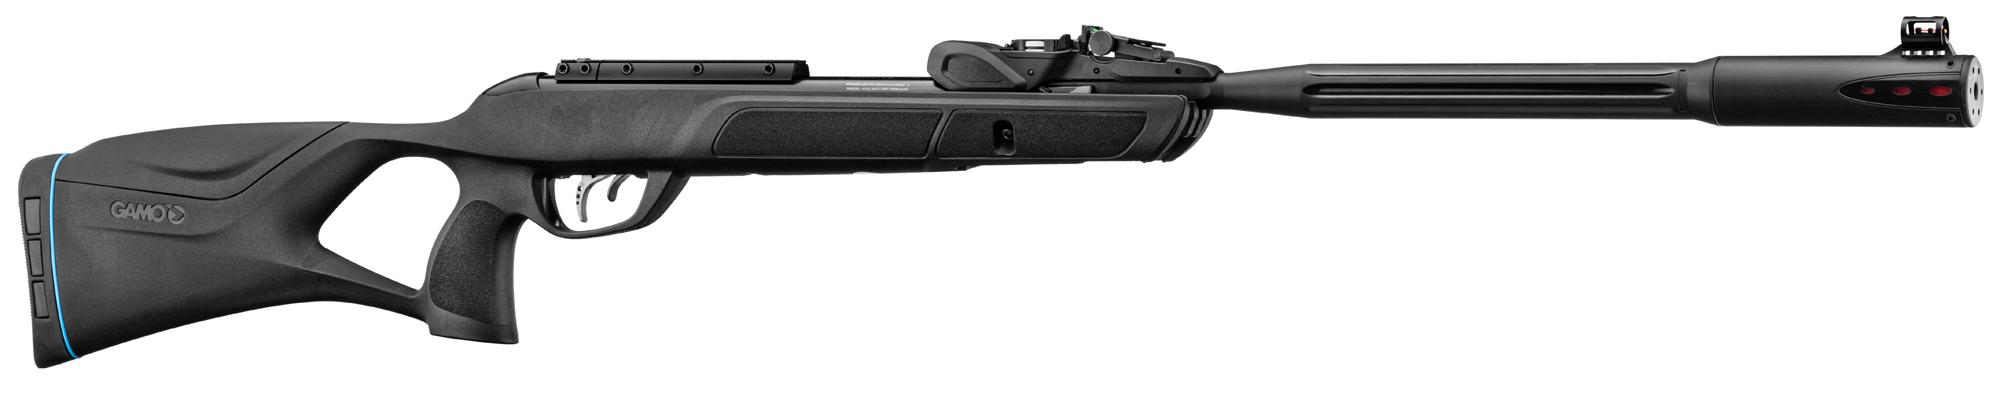 Gamo Roadster IGT 10x Gen2 calibre 4.5mm 19.9joules